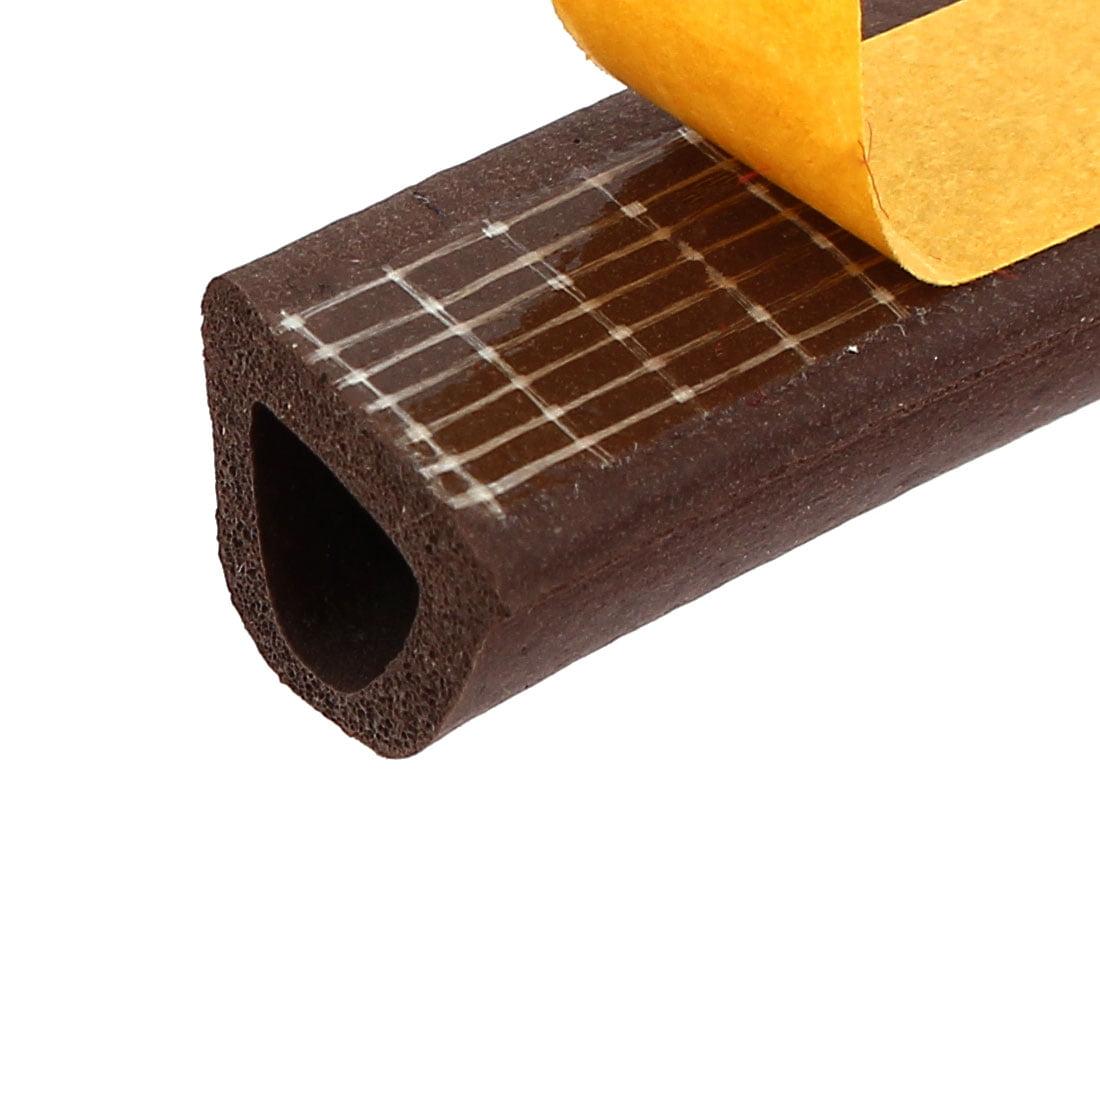 Window Door EPDM Foam Rubber Weatherstrip Seal Strip Brown 14mmx12mmx9.8Ft - image 1 of 3